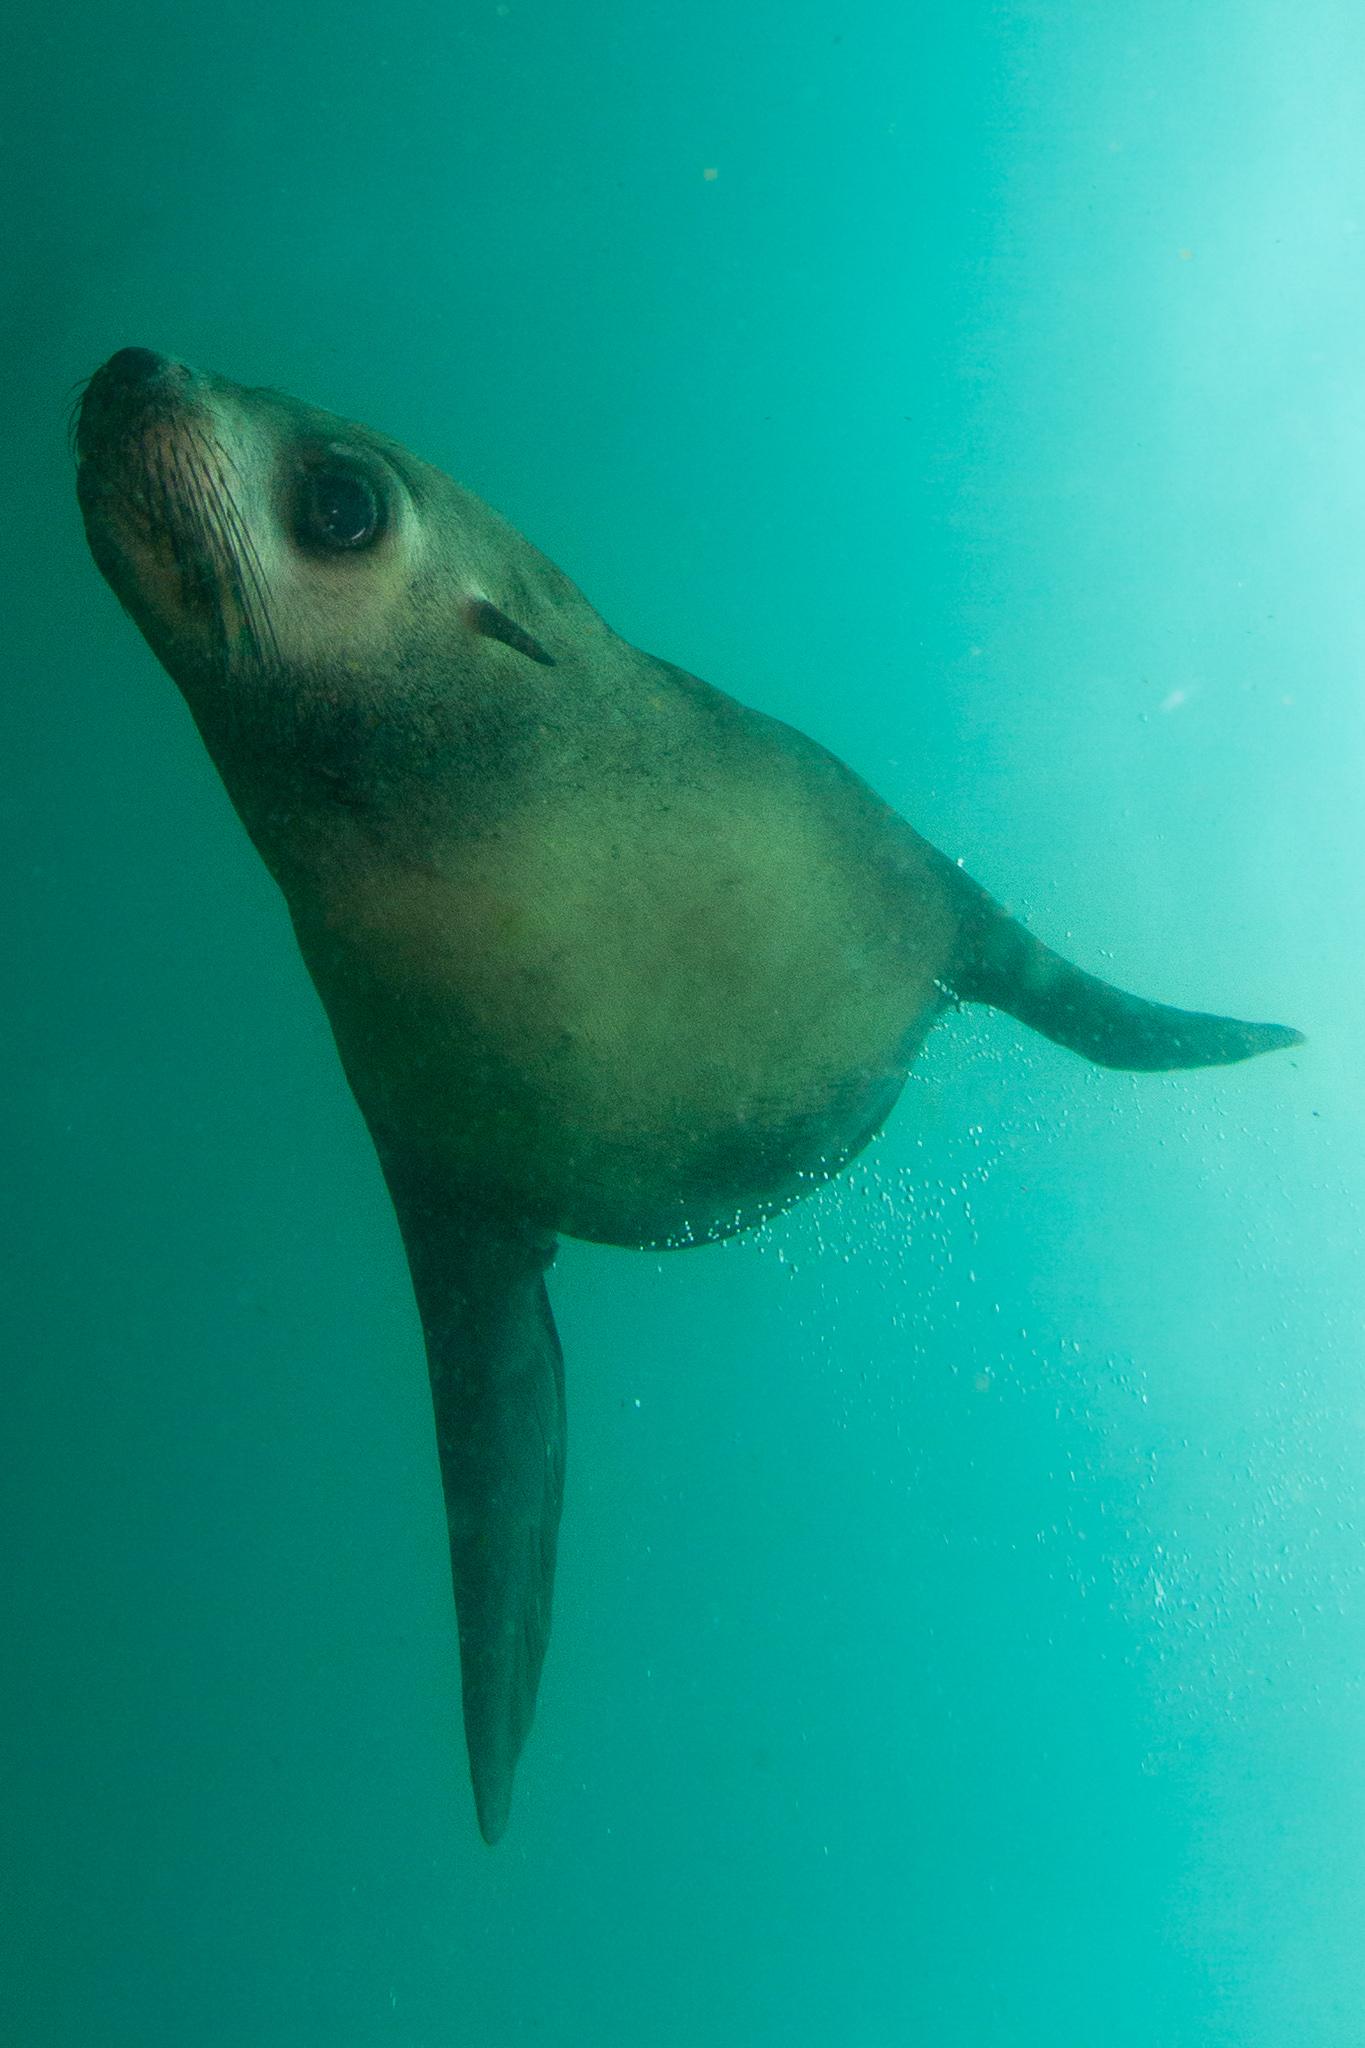 Seal Jervis Bay NSW Australia